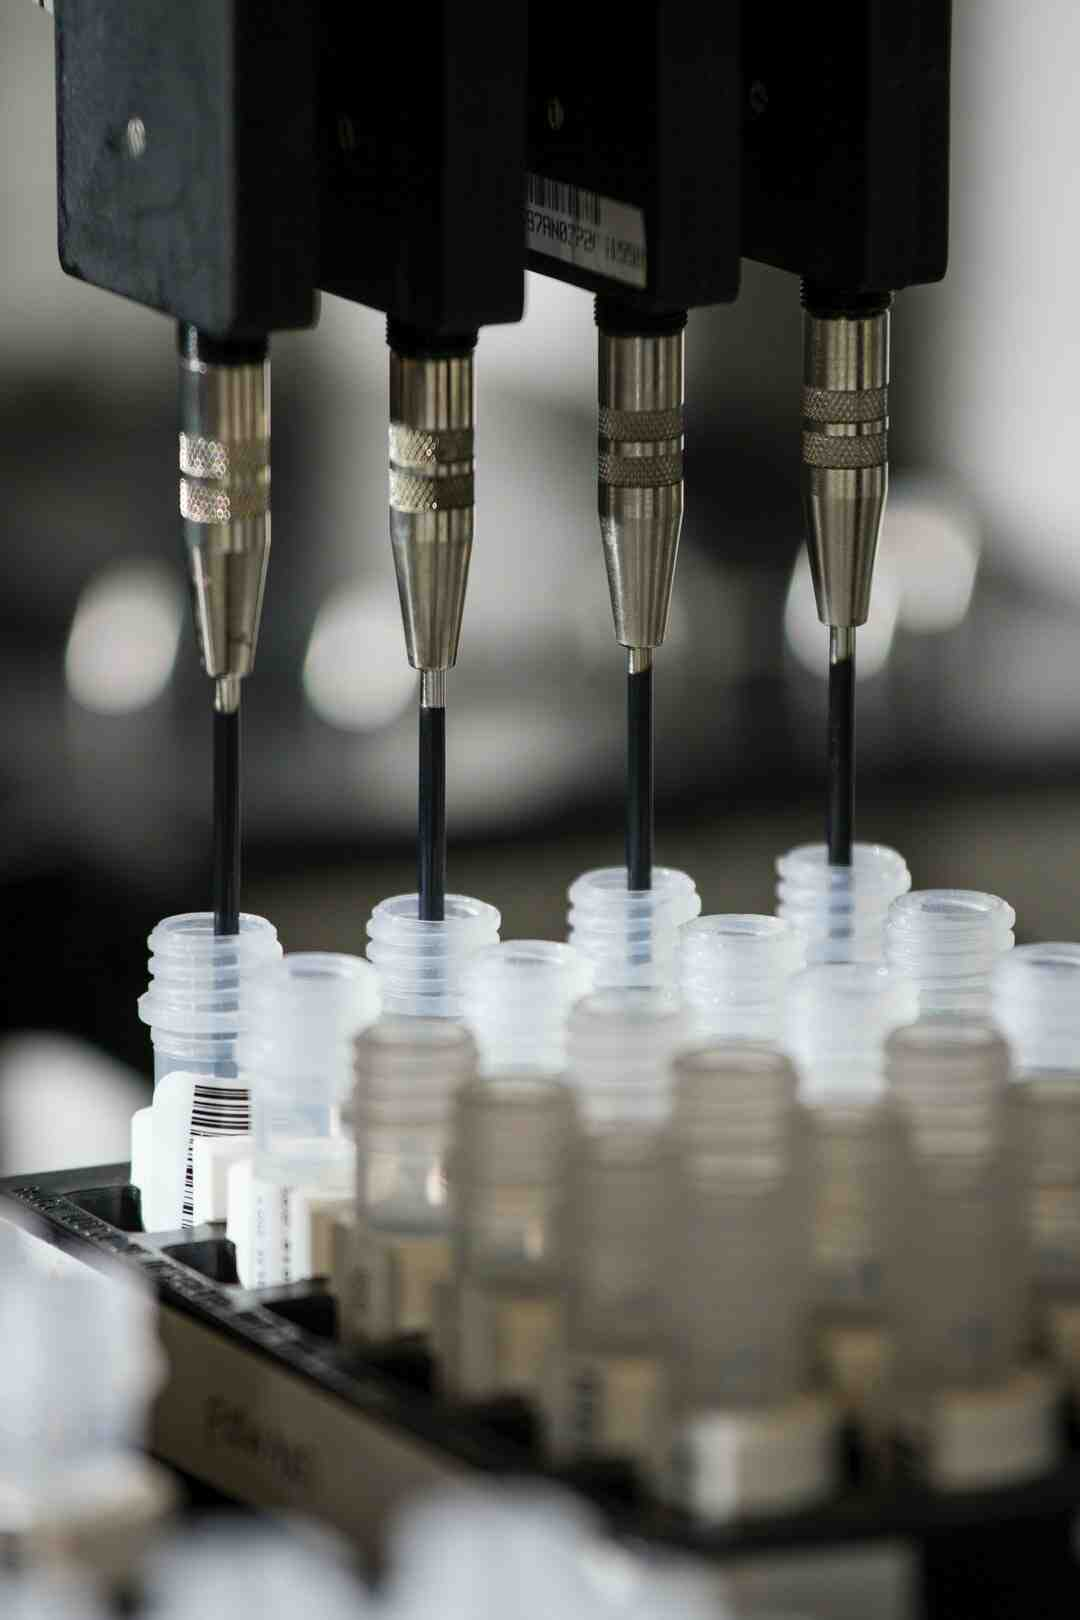 Machines à gaufres : Avis, test, Comparatif, Tarifs, Prix